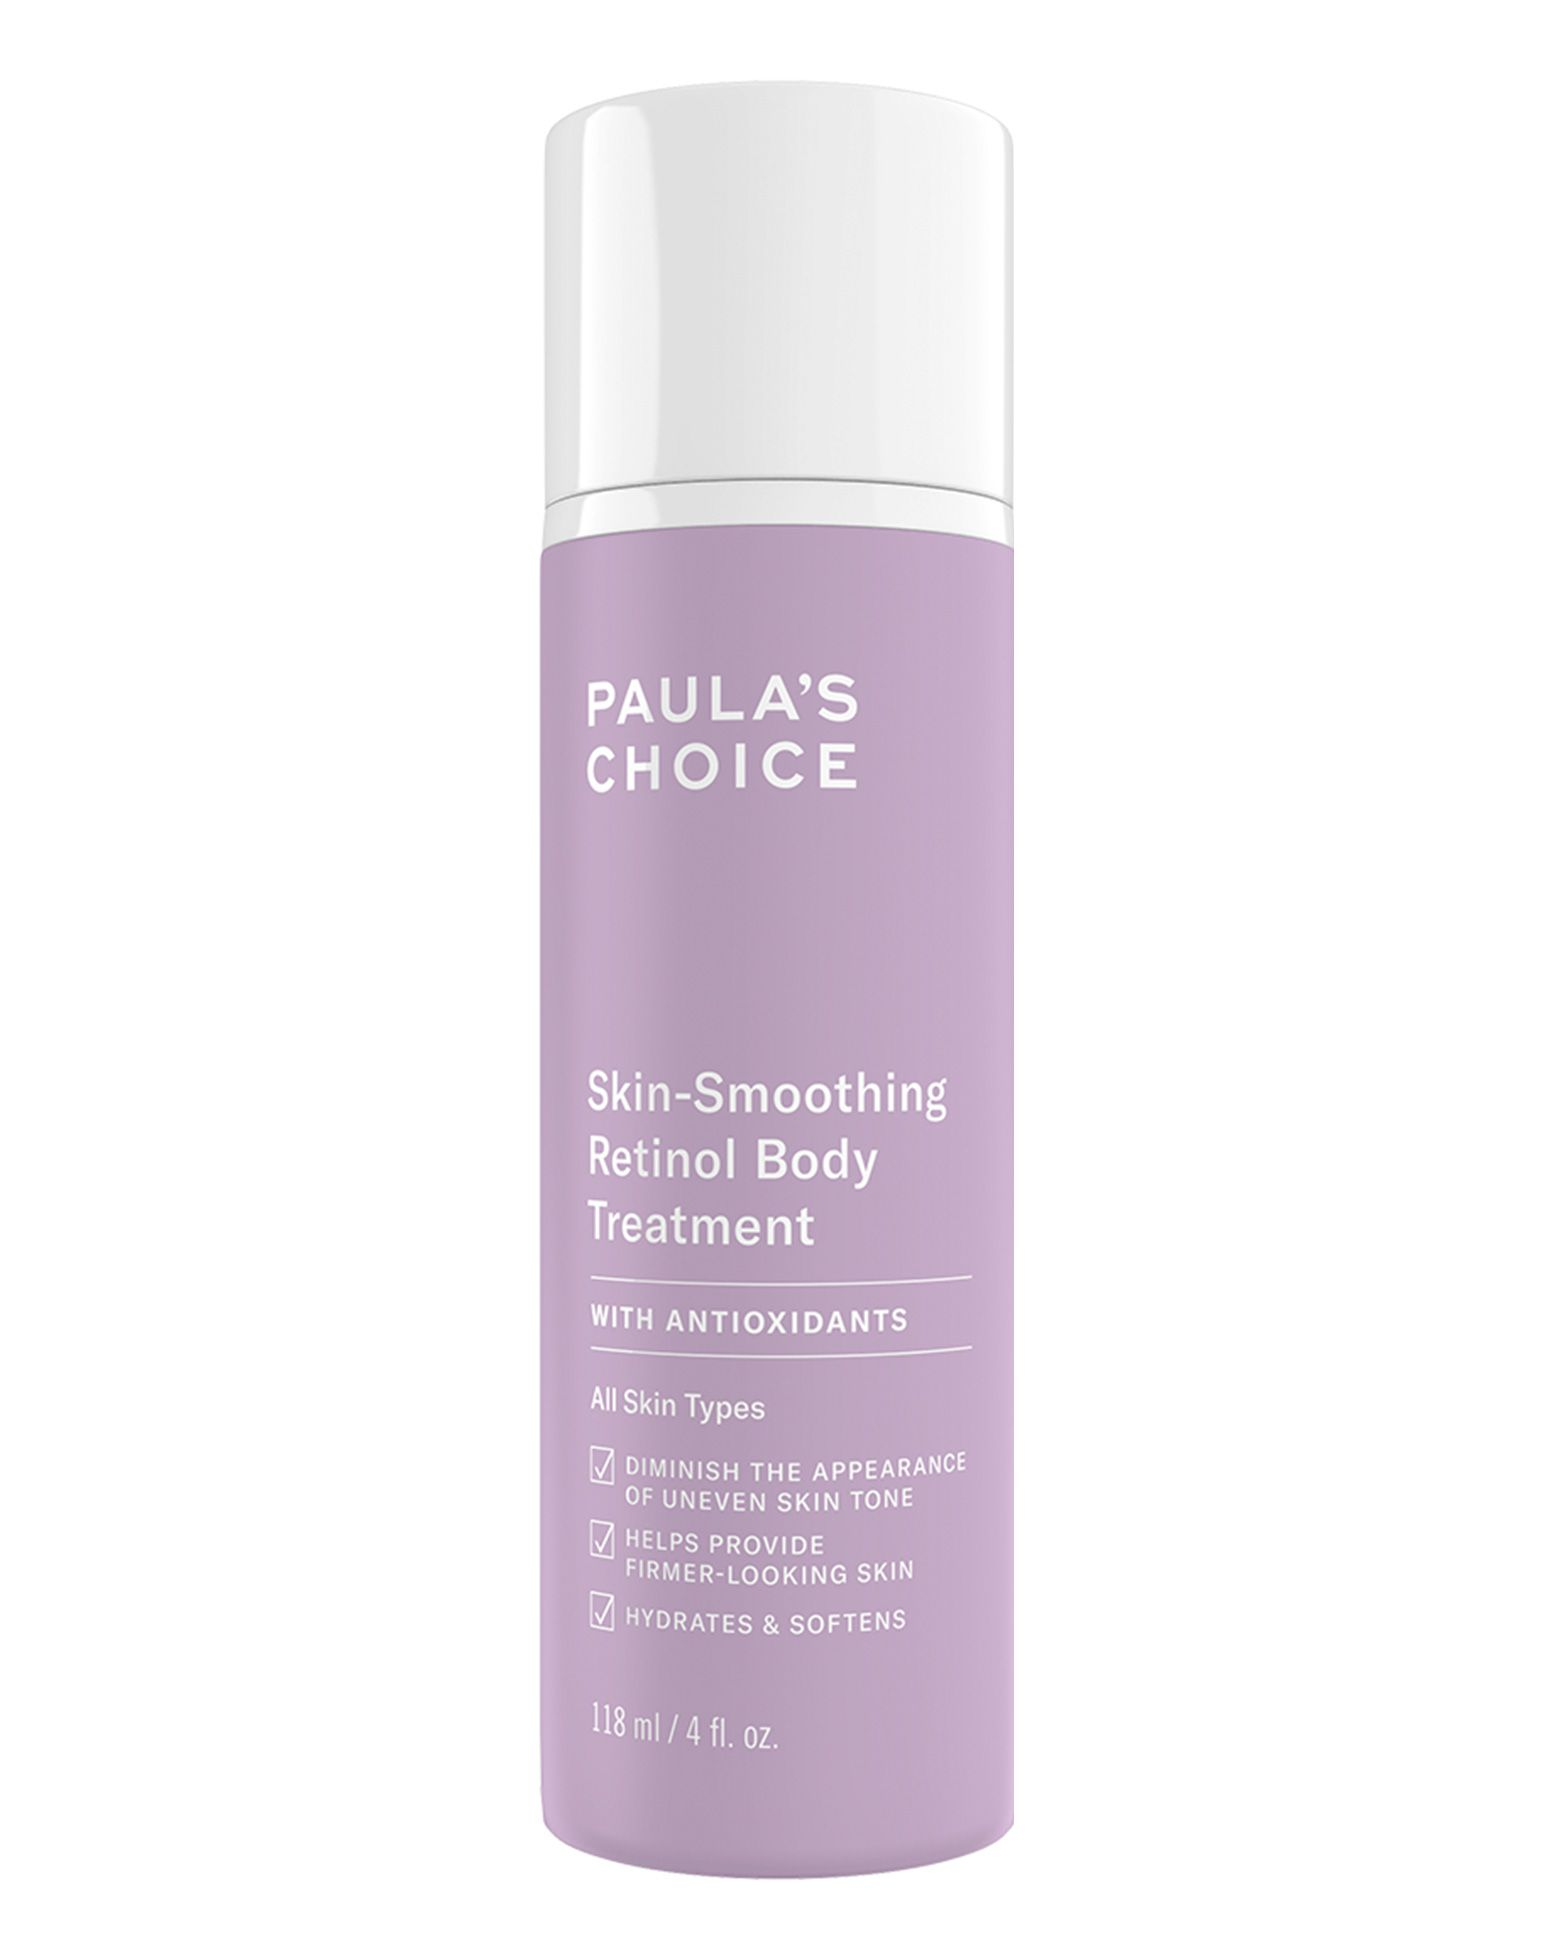 cellulite creams: paula's choice retinol body treatment